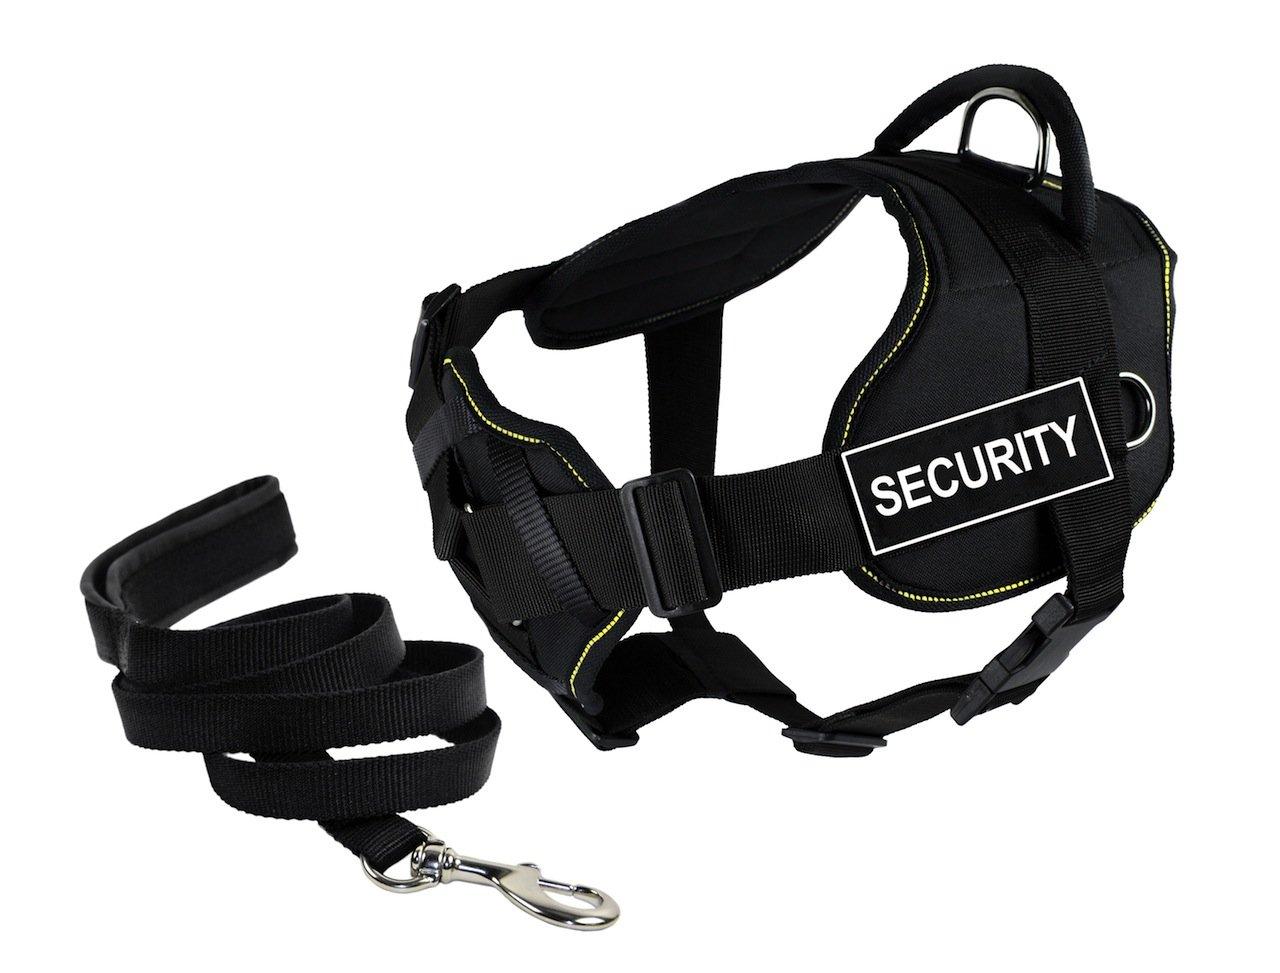 Dean & Tyler DT Fun Petto Supporto Security Harness, Medium, con 1,8 m Padded Puppy guinzaglio.